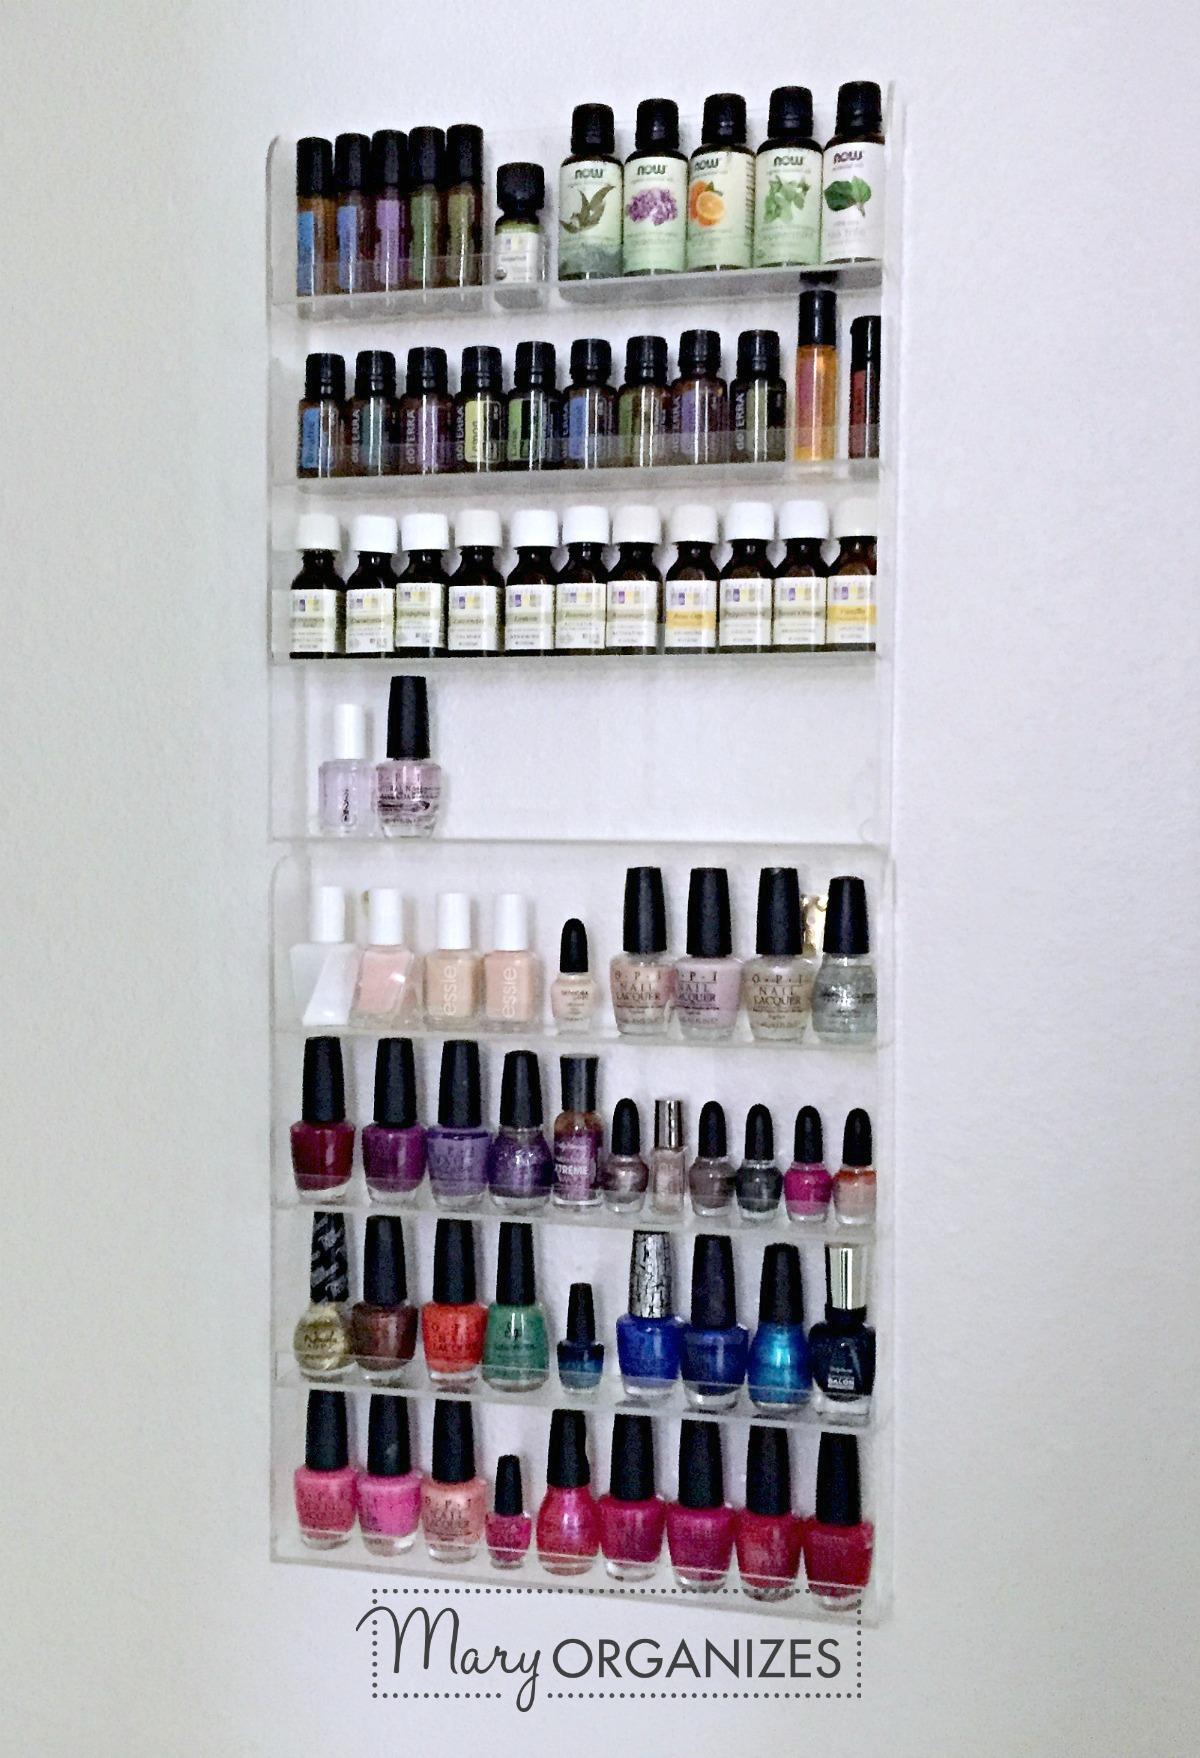 Organizing Nail Polish and Essential Oils -v3